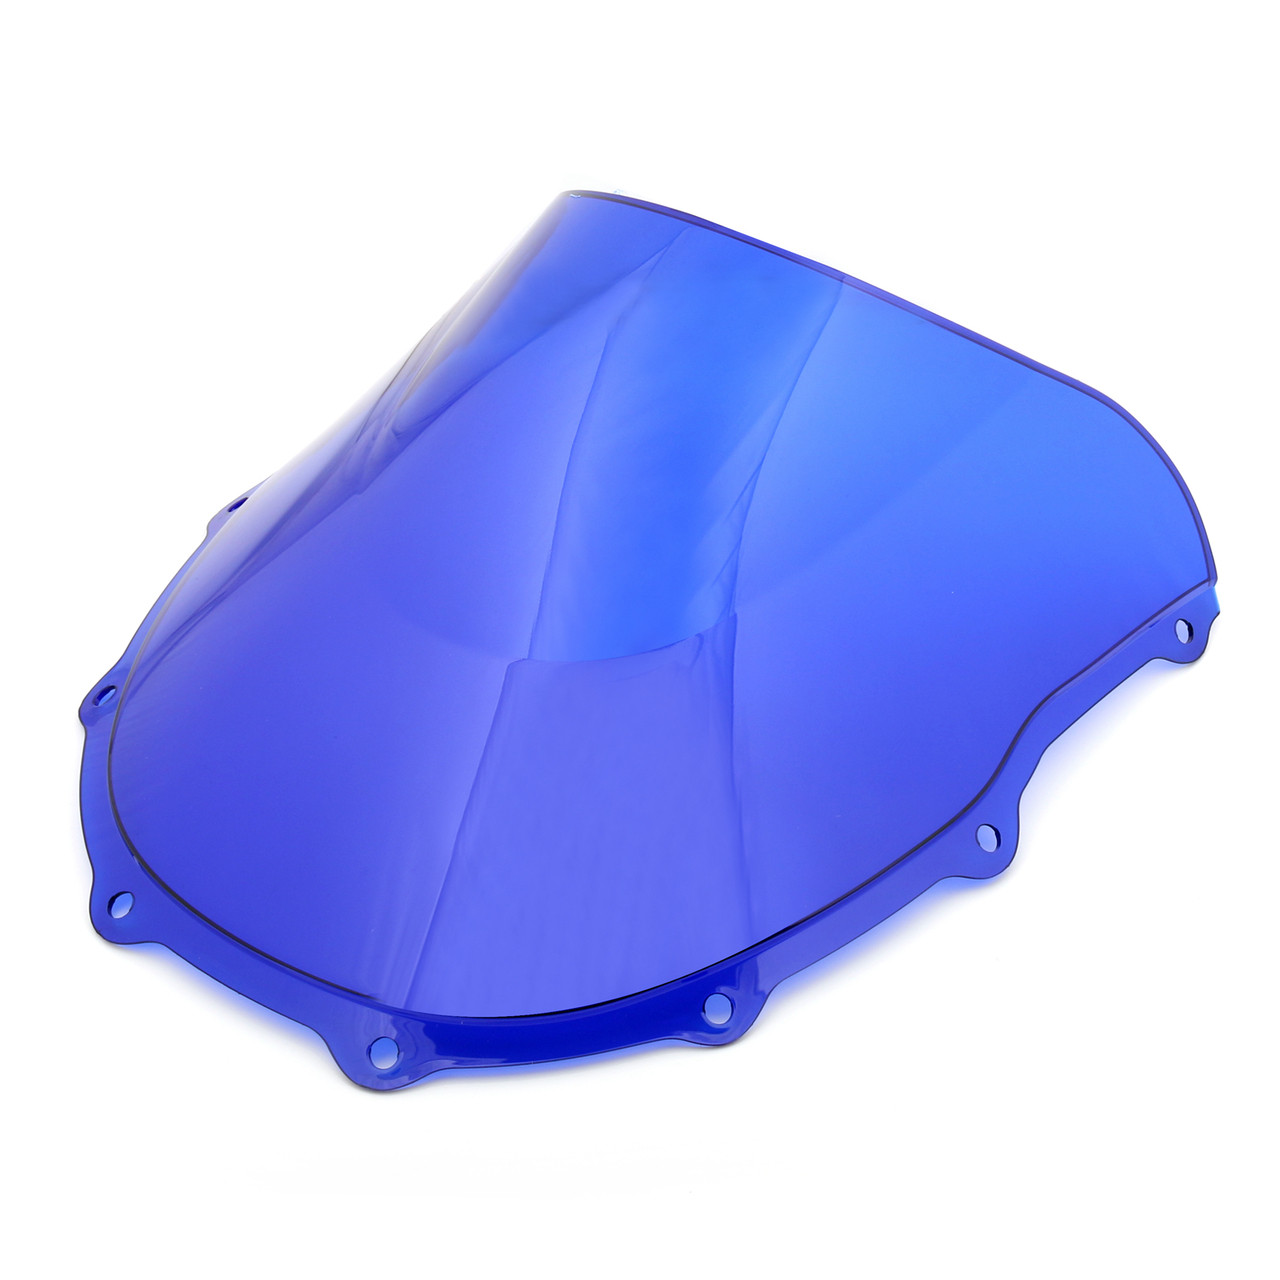 Windscreen Windshield Screen Protector Kawasaki Ninja ZX7R ZX 7R (1996-2003) Blue